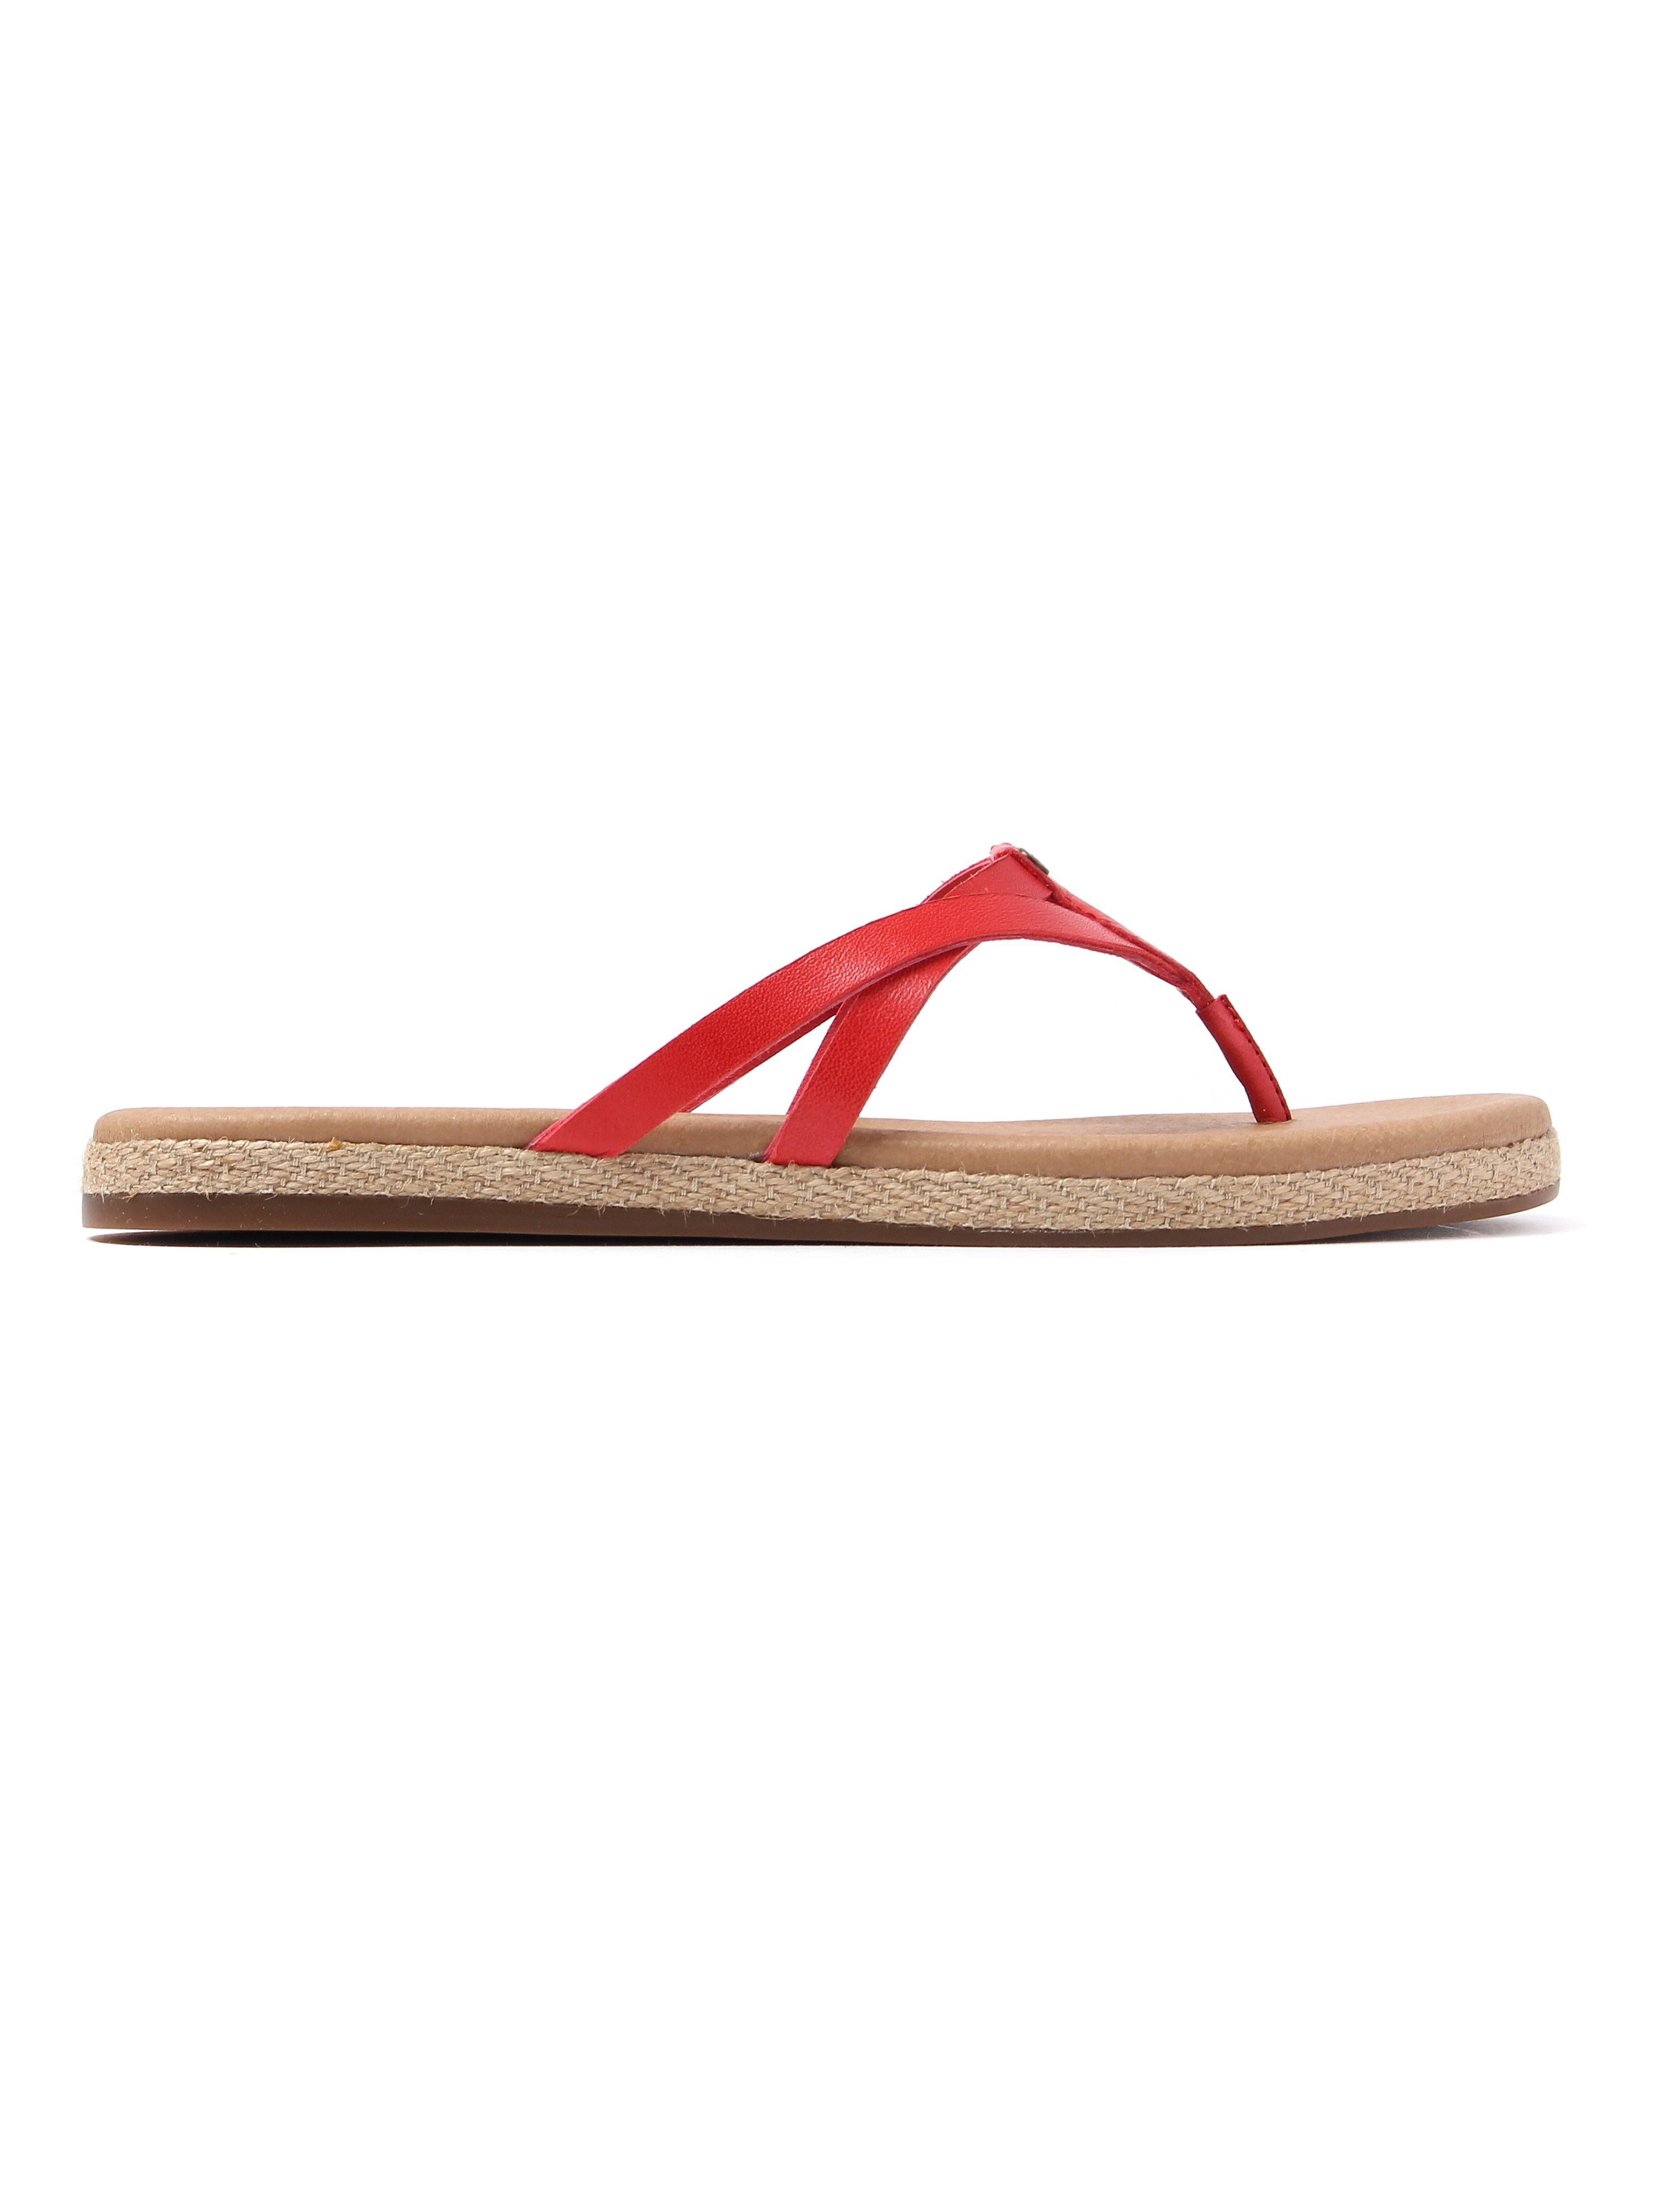 Ugg Women's Annice Leather Flip Flops - Tango